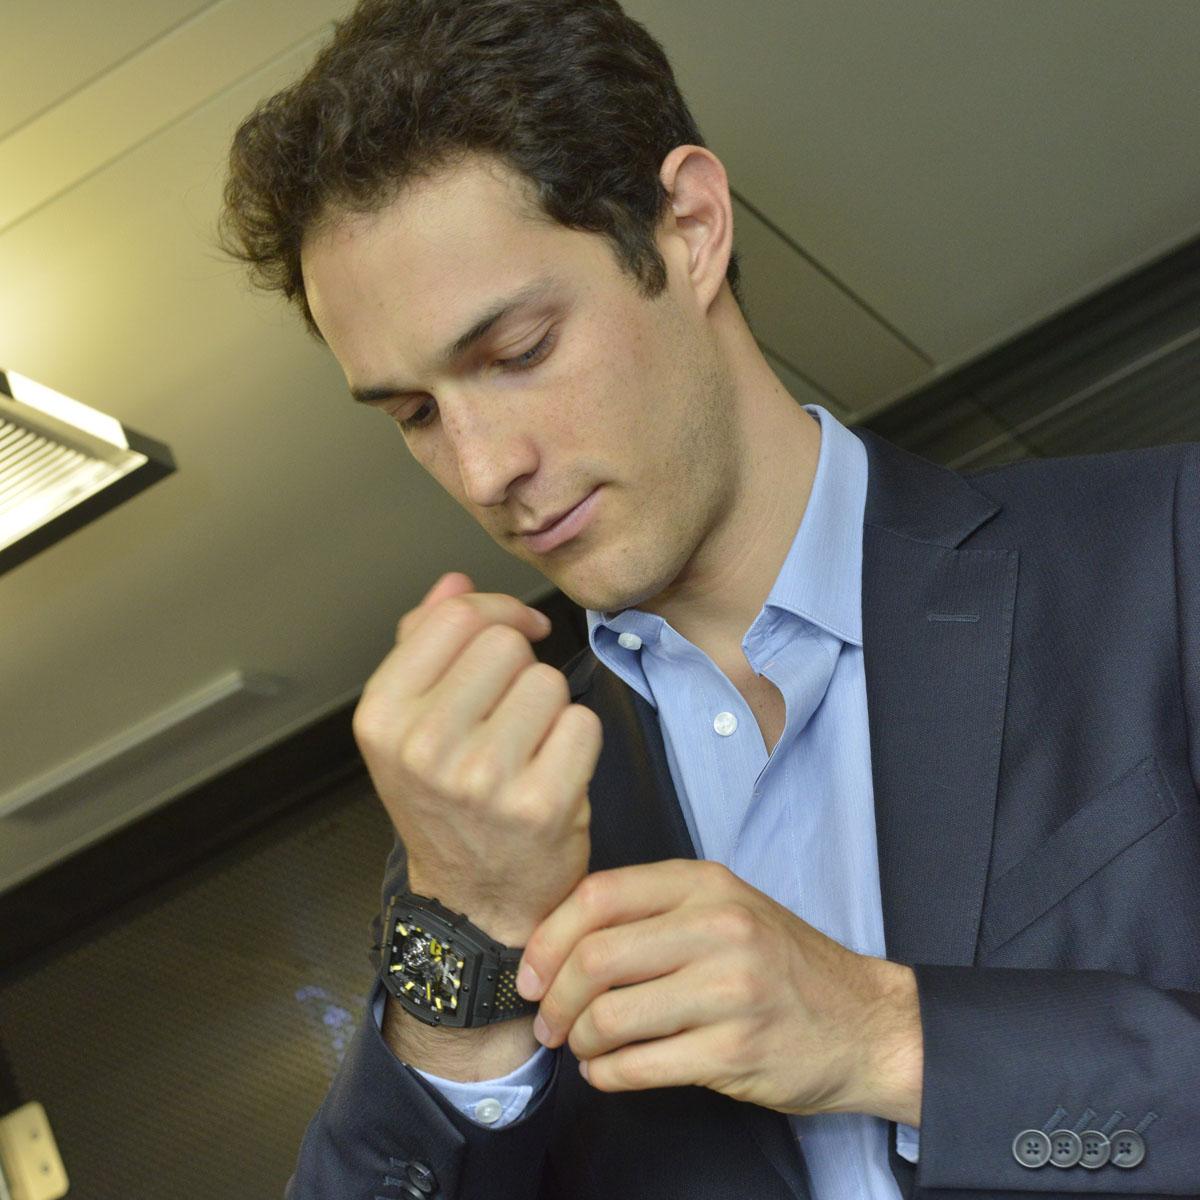 La Cote des Montres : Photo - Hublot MP-06 Senna